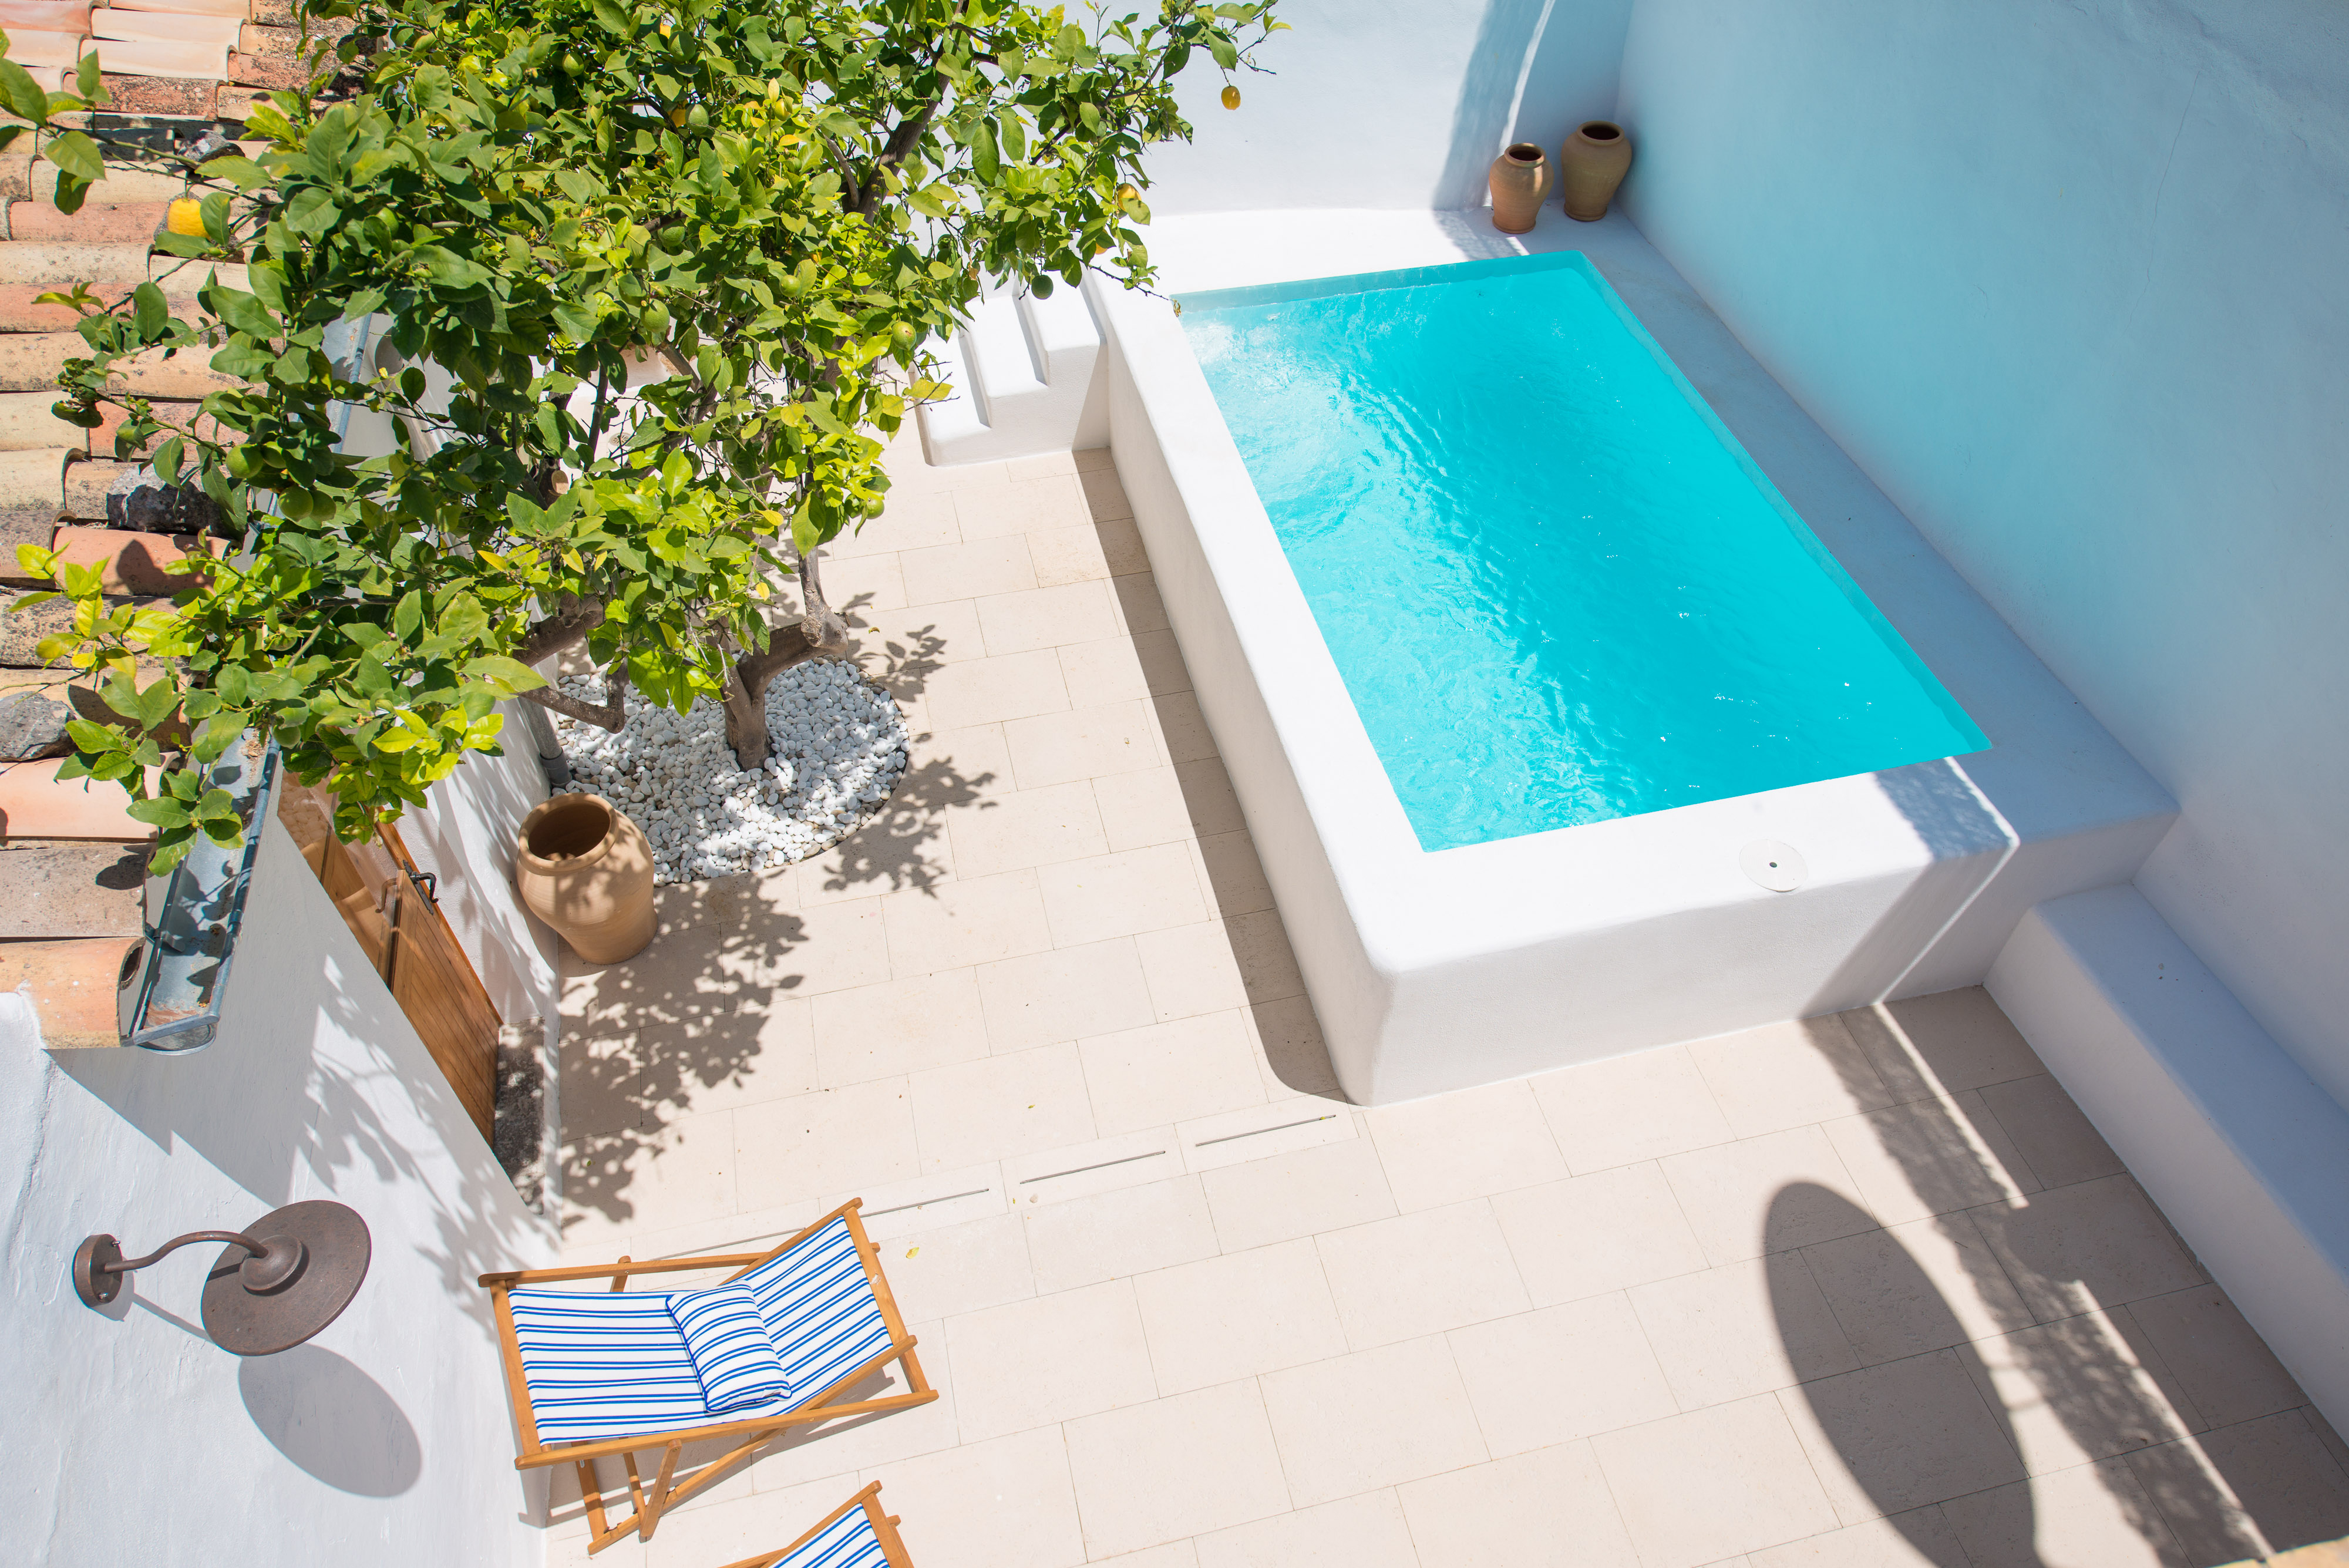 Maison de vacances CA NA MANDOLA (1956247), Alaro, Majorque, Iles Baléares, Espagne, image 31